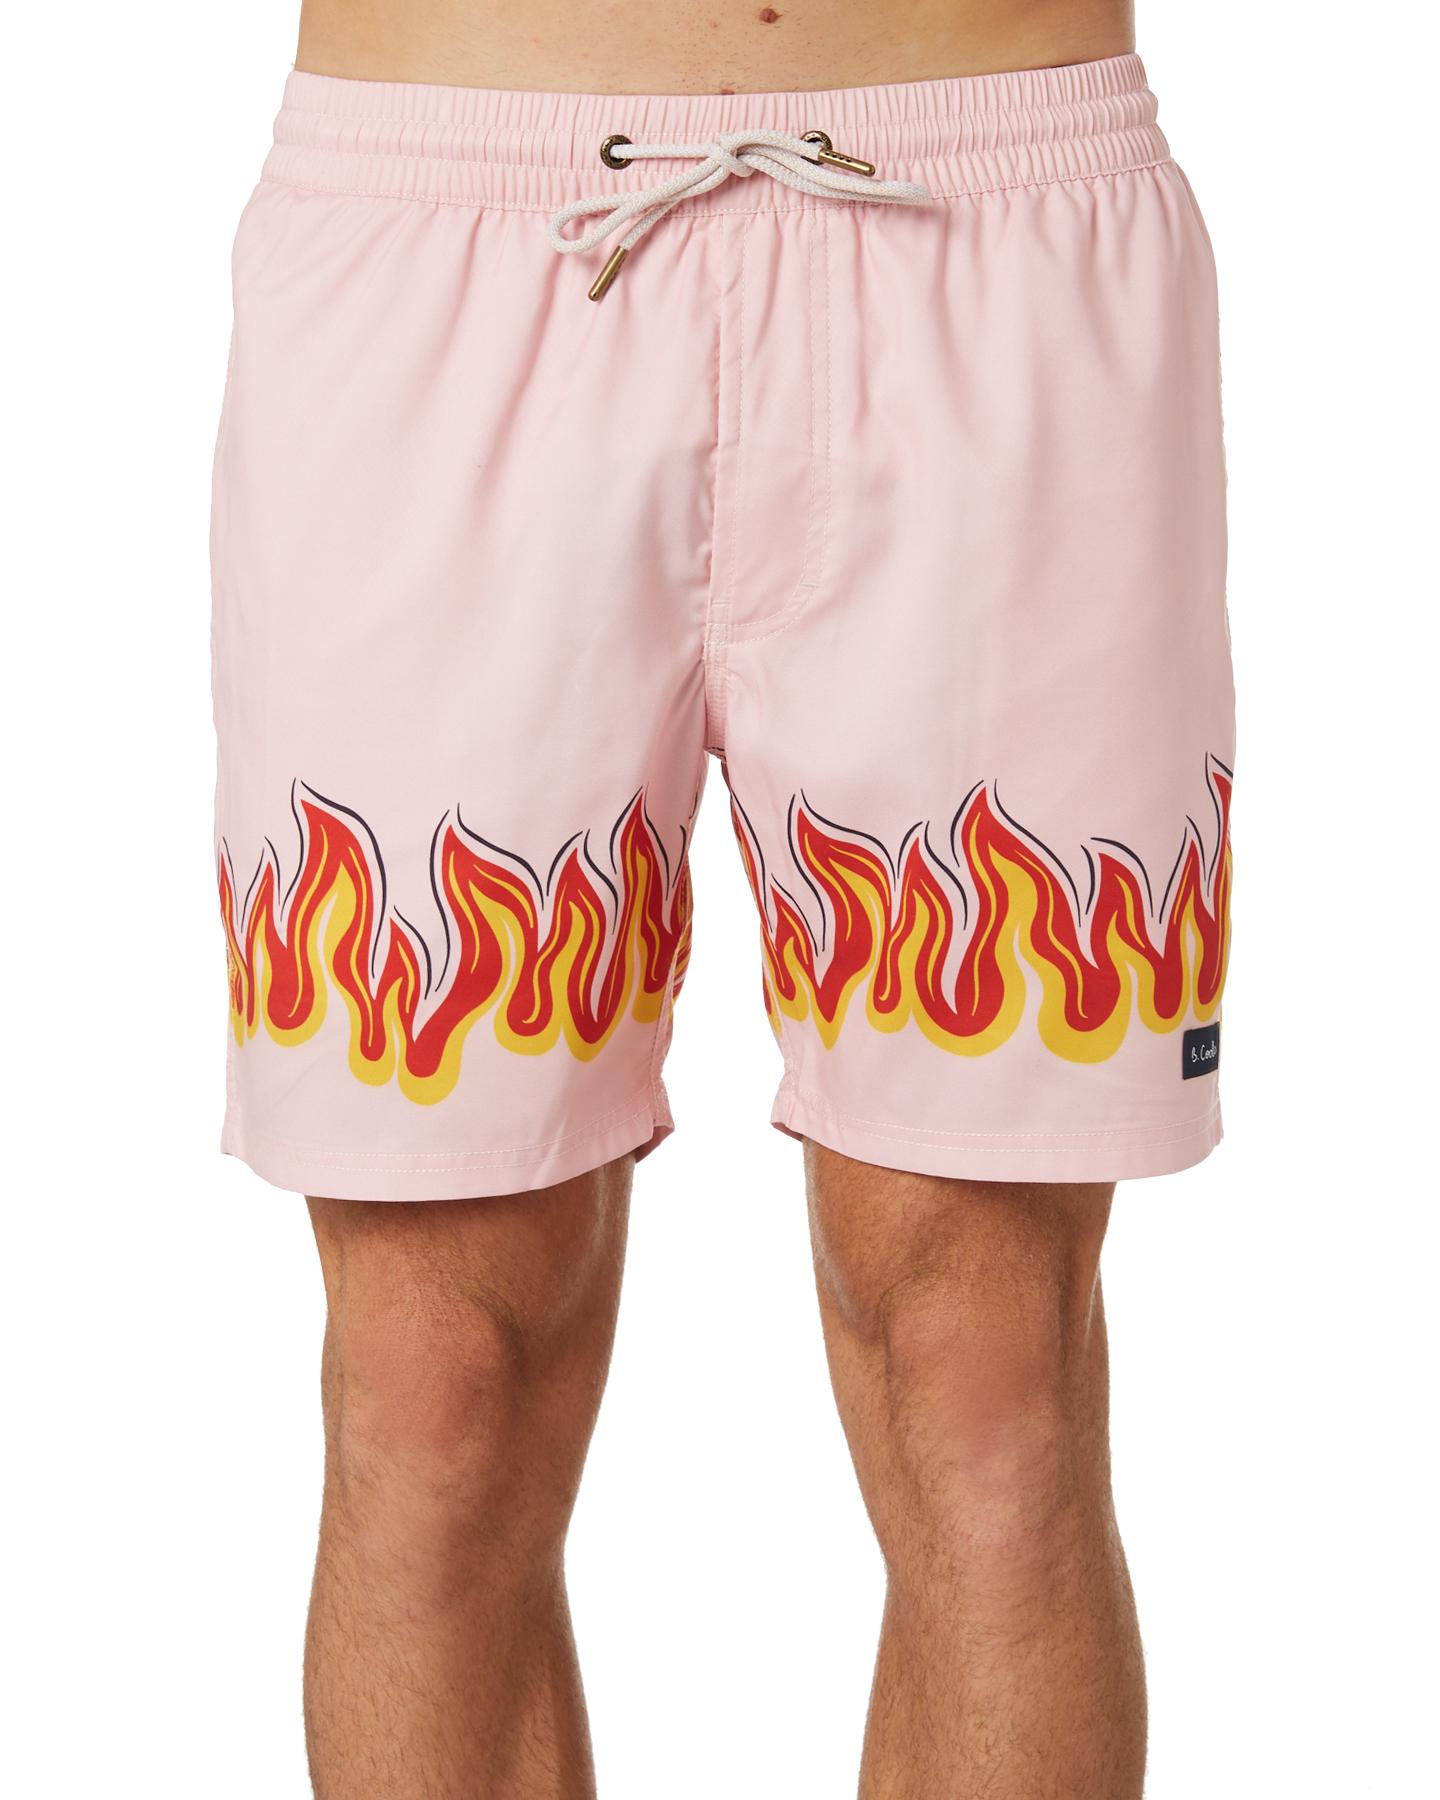 6daa05eb7e6bd0 Barney Cools Poolside Mens Beach Short - Pink Flames | SurfStitch